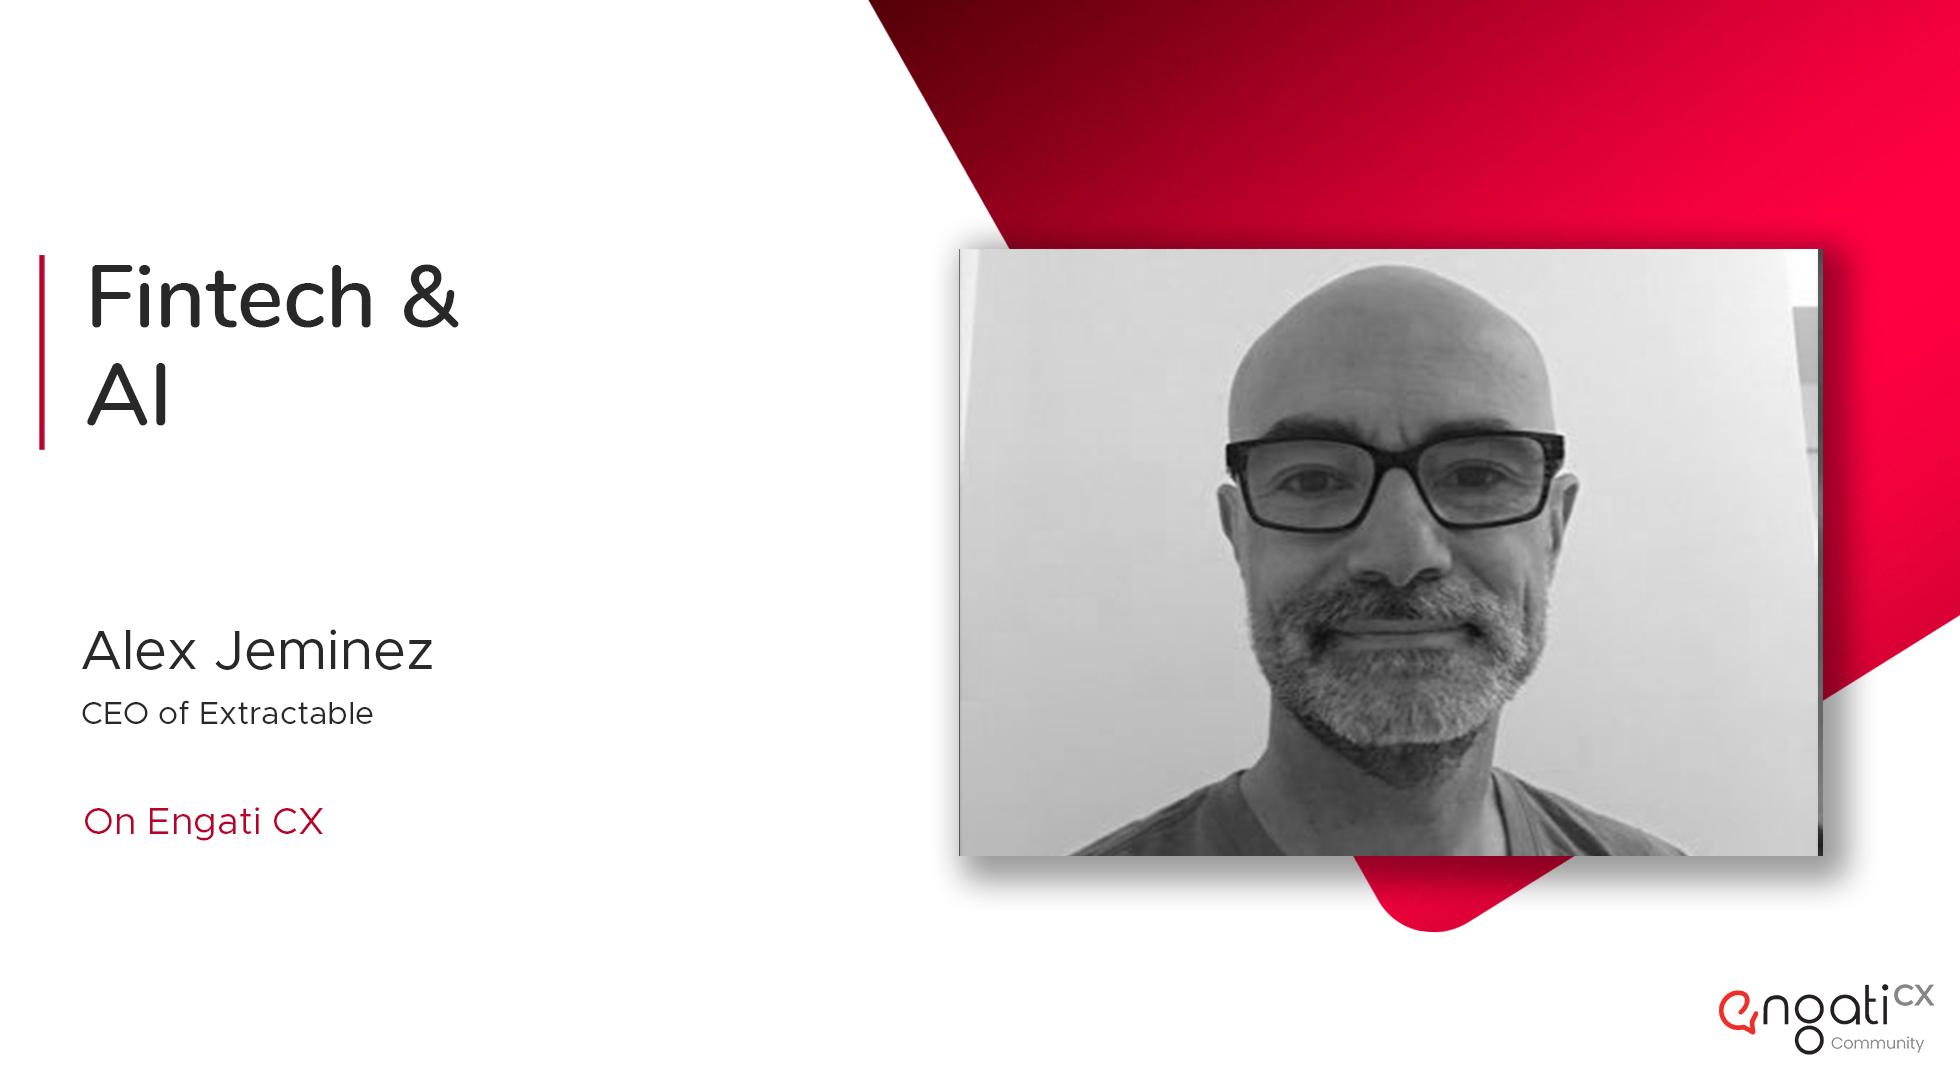 Alex Jimenez | AI in fintech | Engati CX